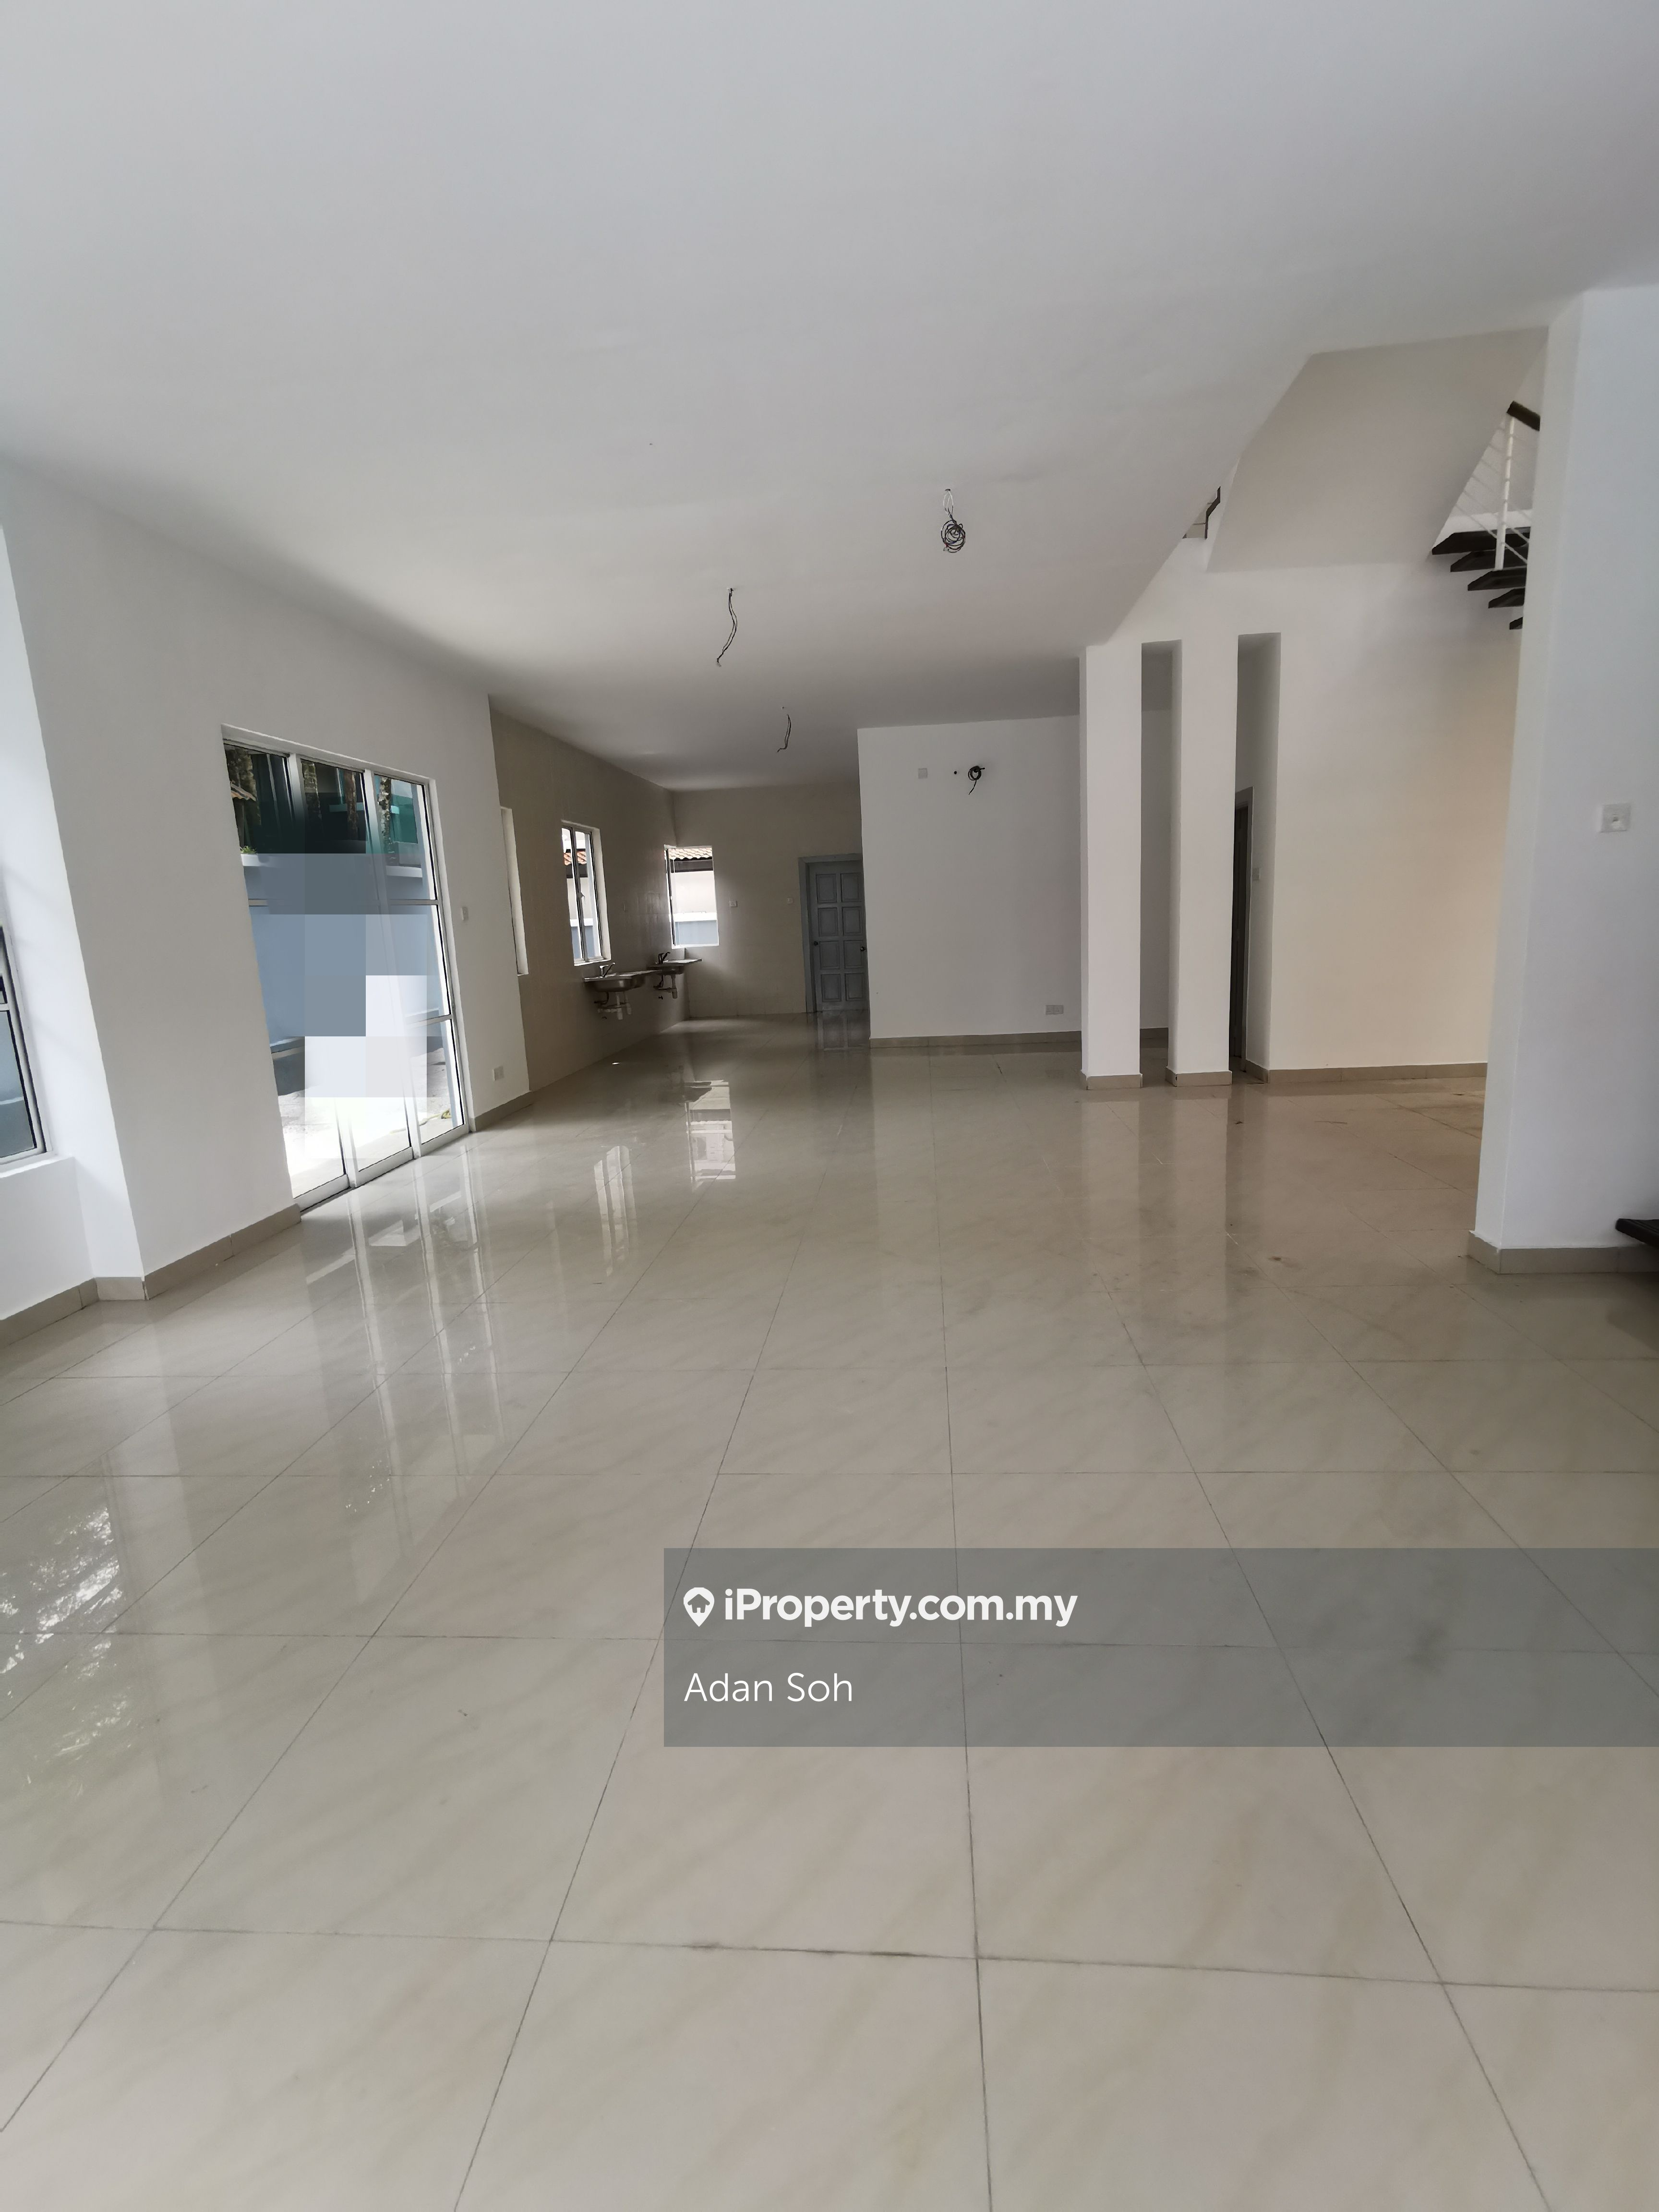 Perdana Residence 1 , One Sierra , Idaman Hill , Selayang